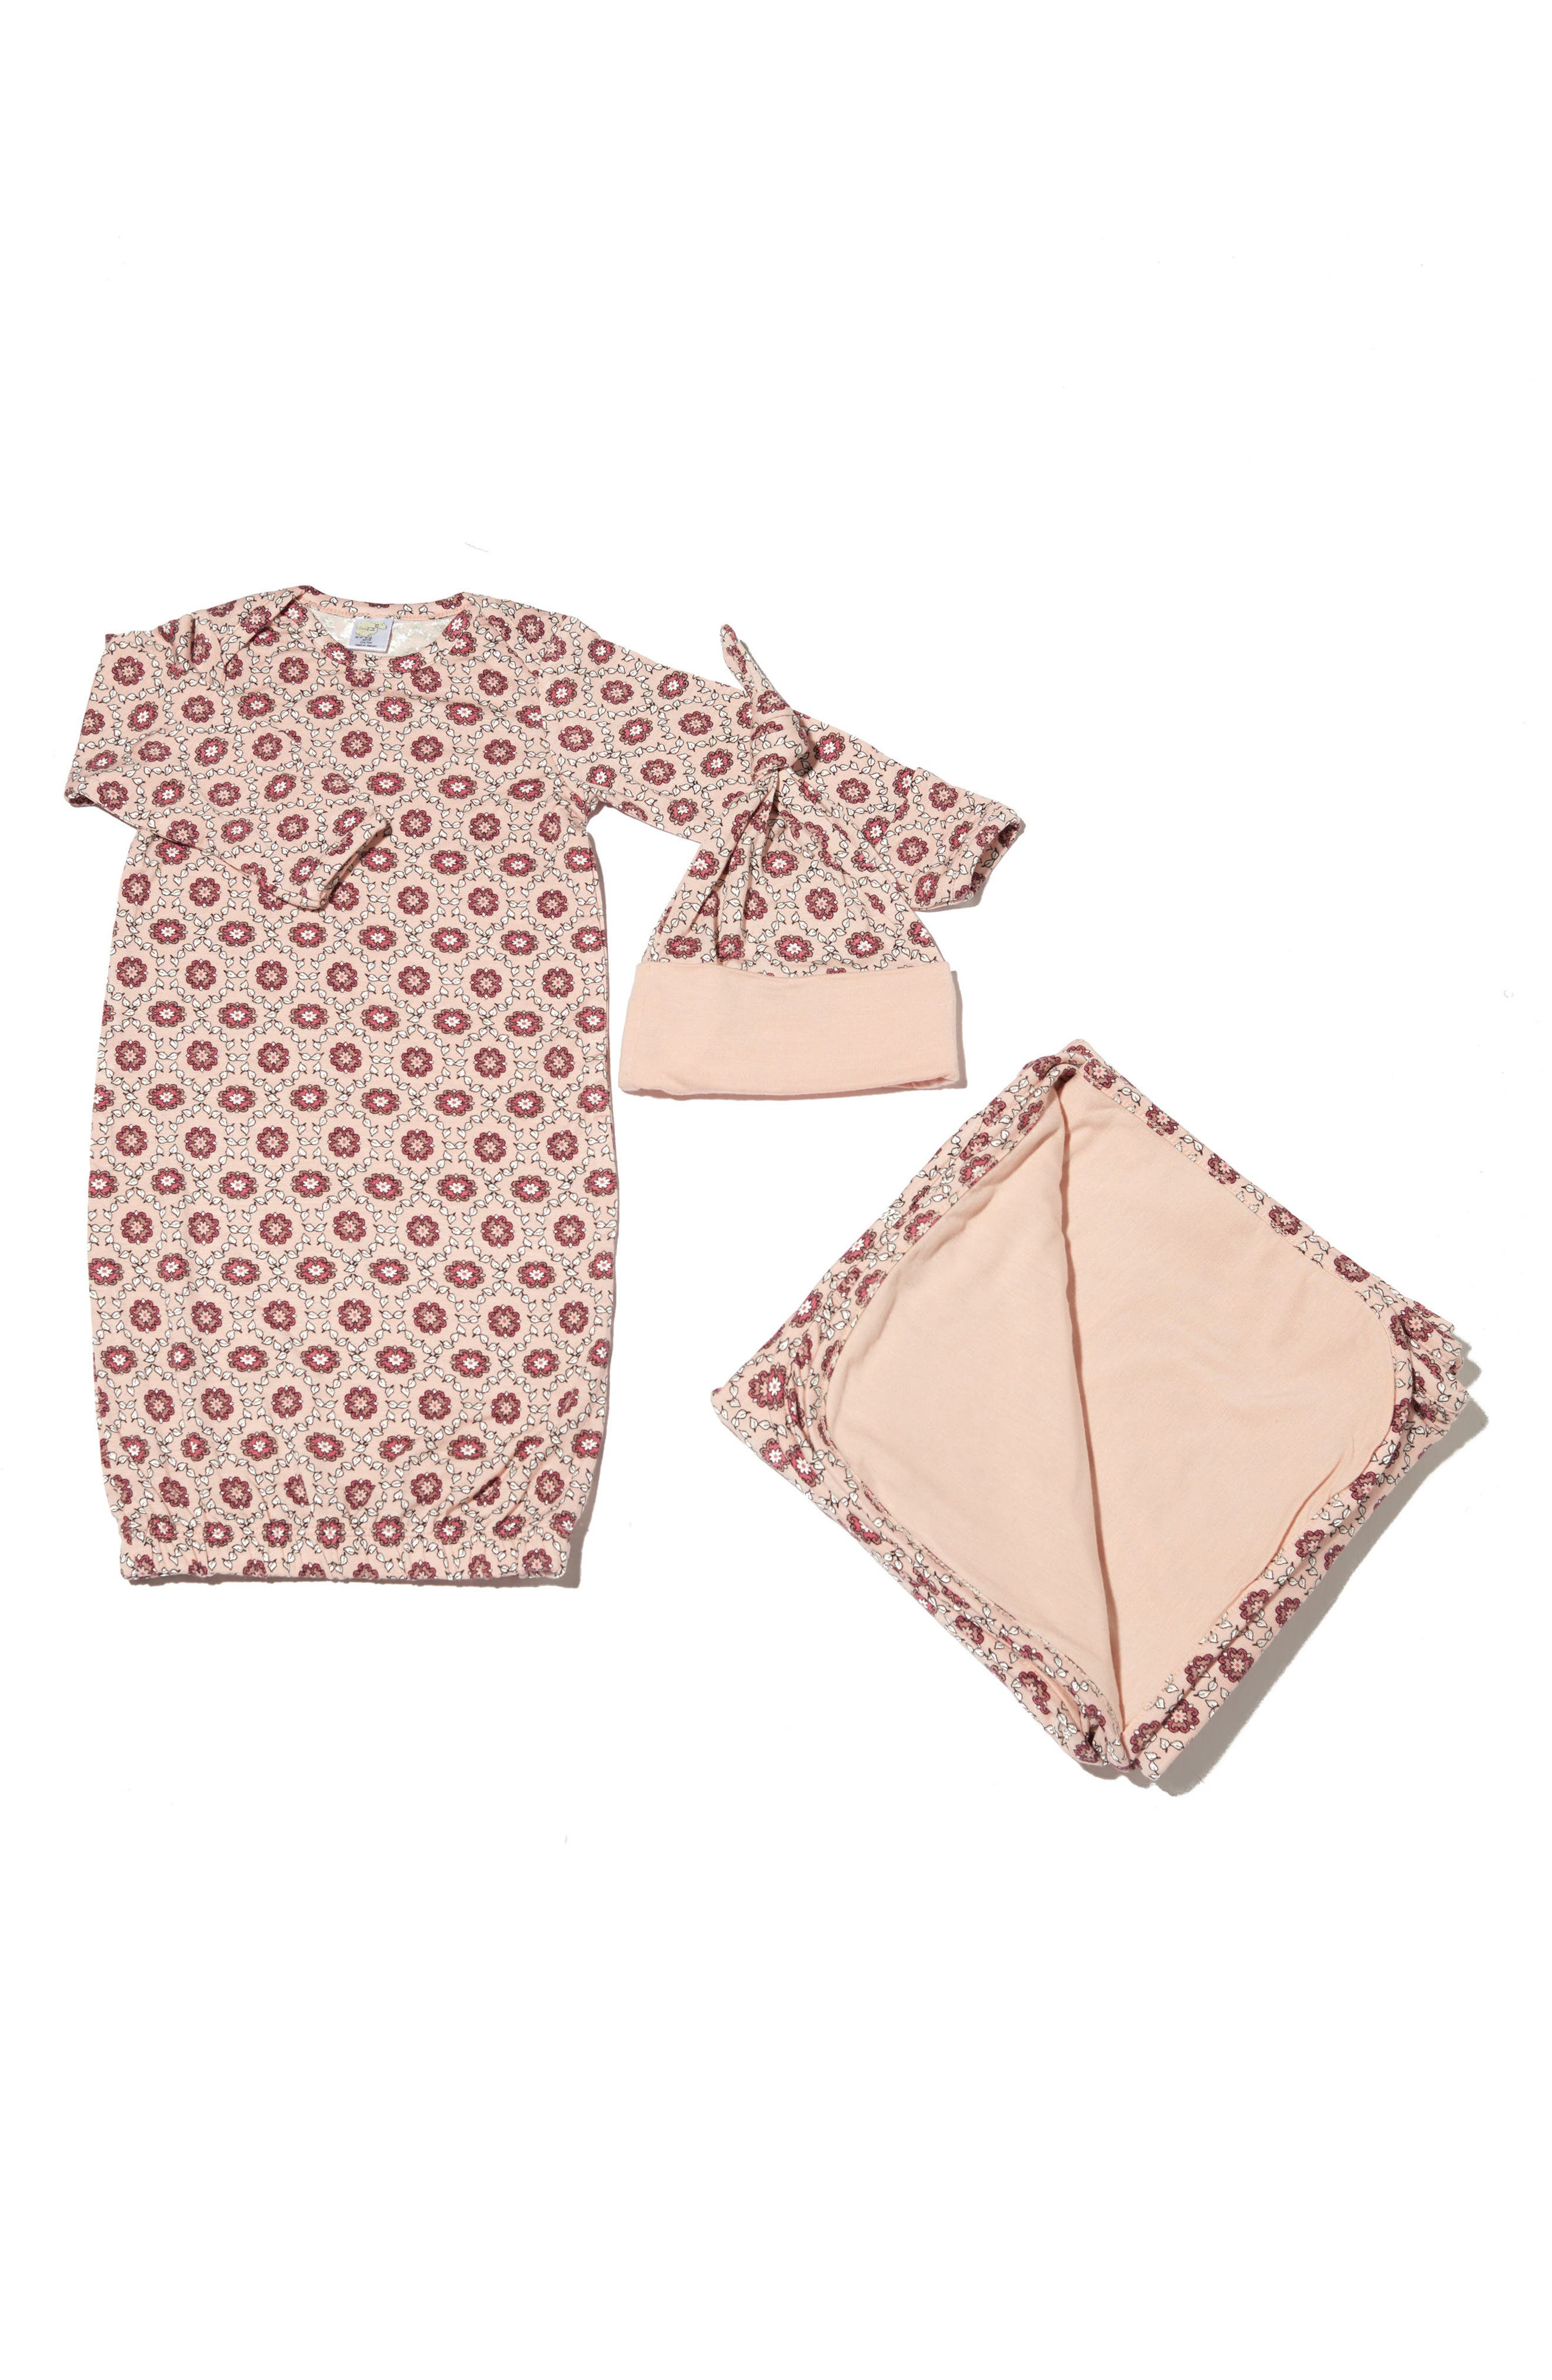 Baby Grey Print Gown, Hat & Blanket Set (Baby Girls)